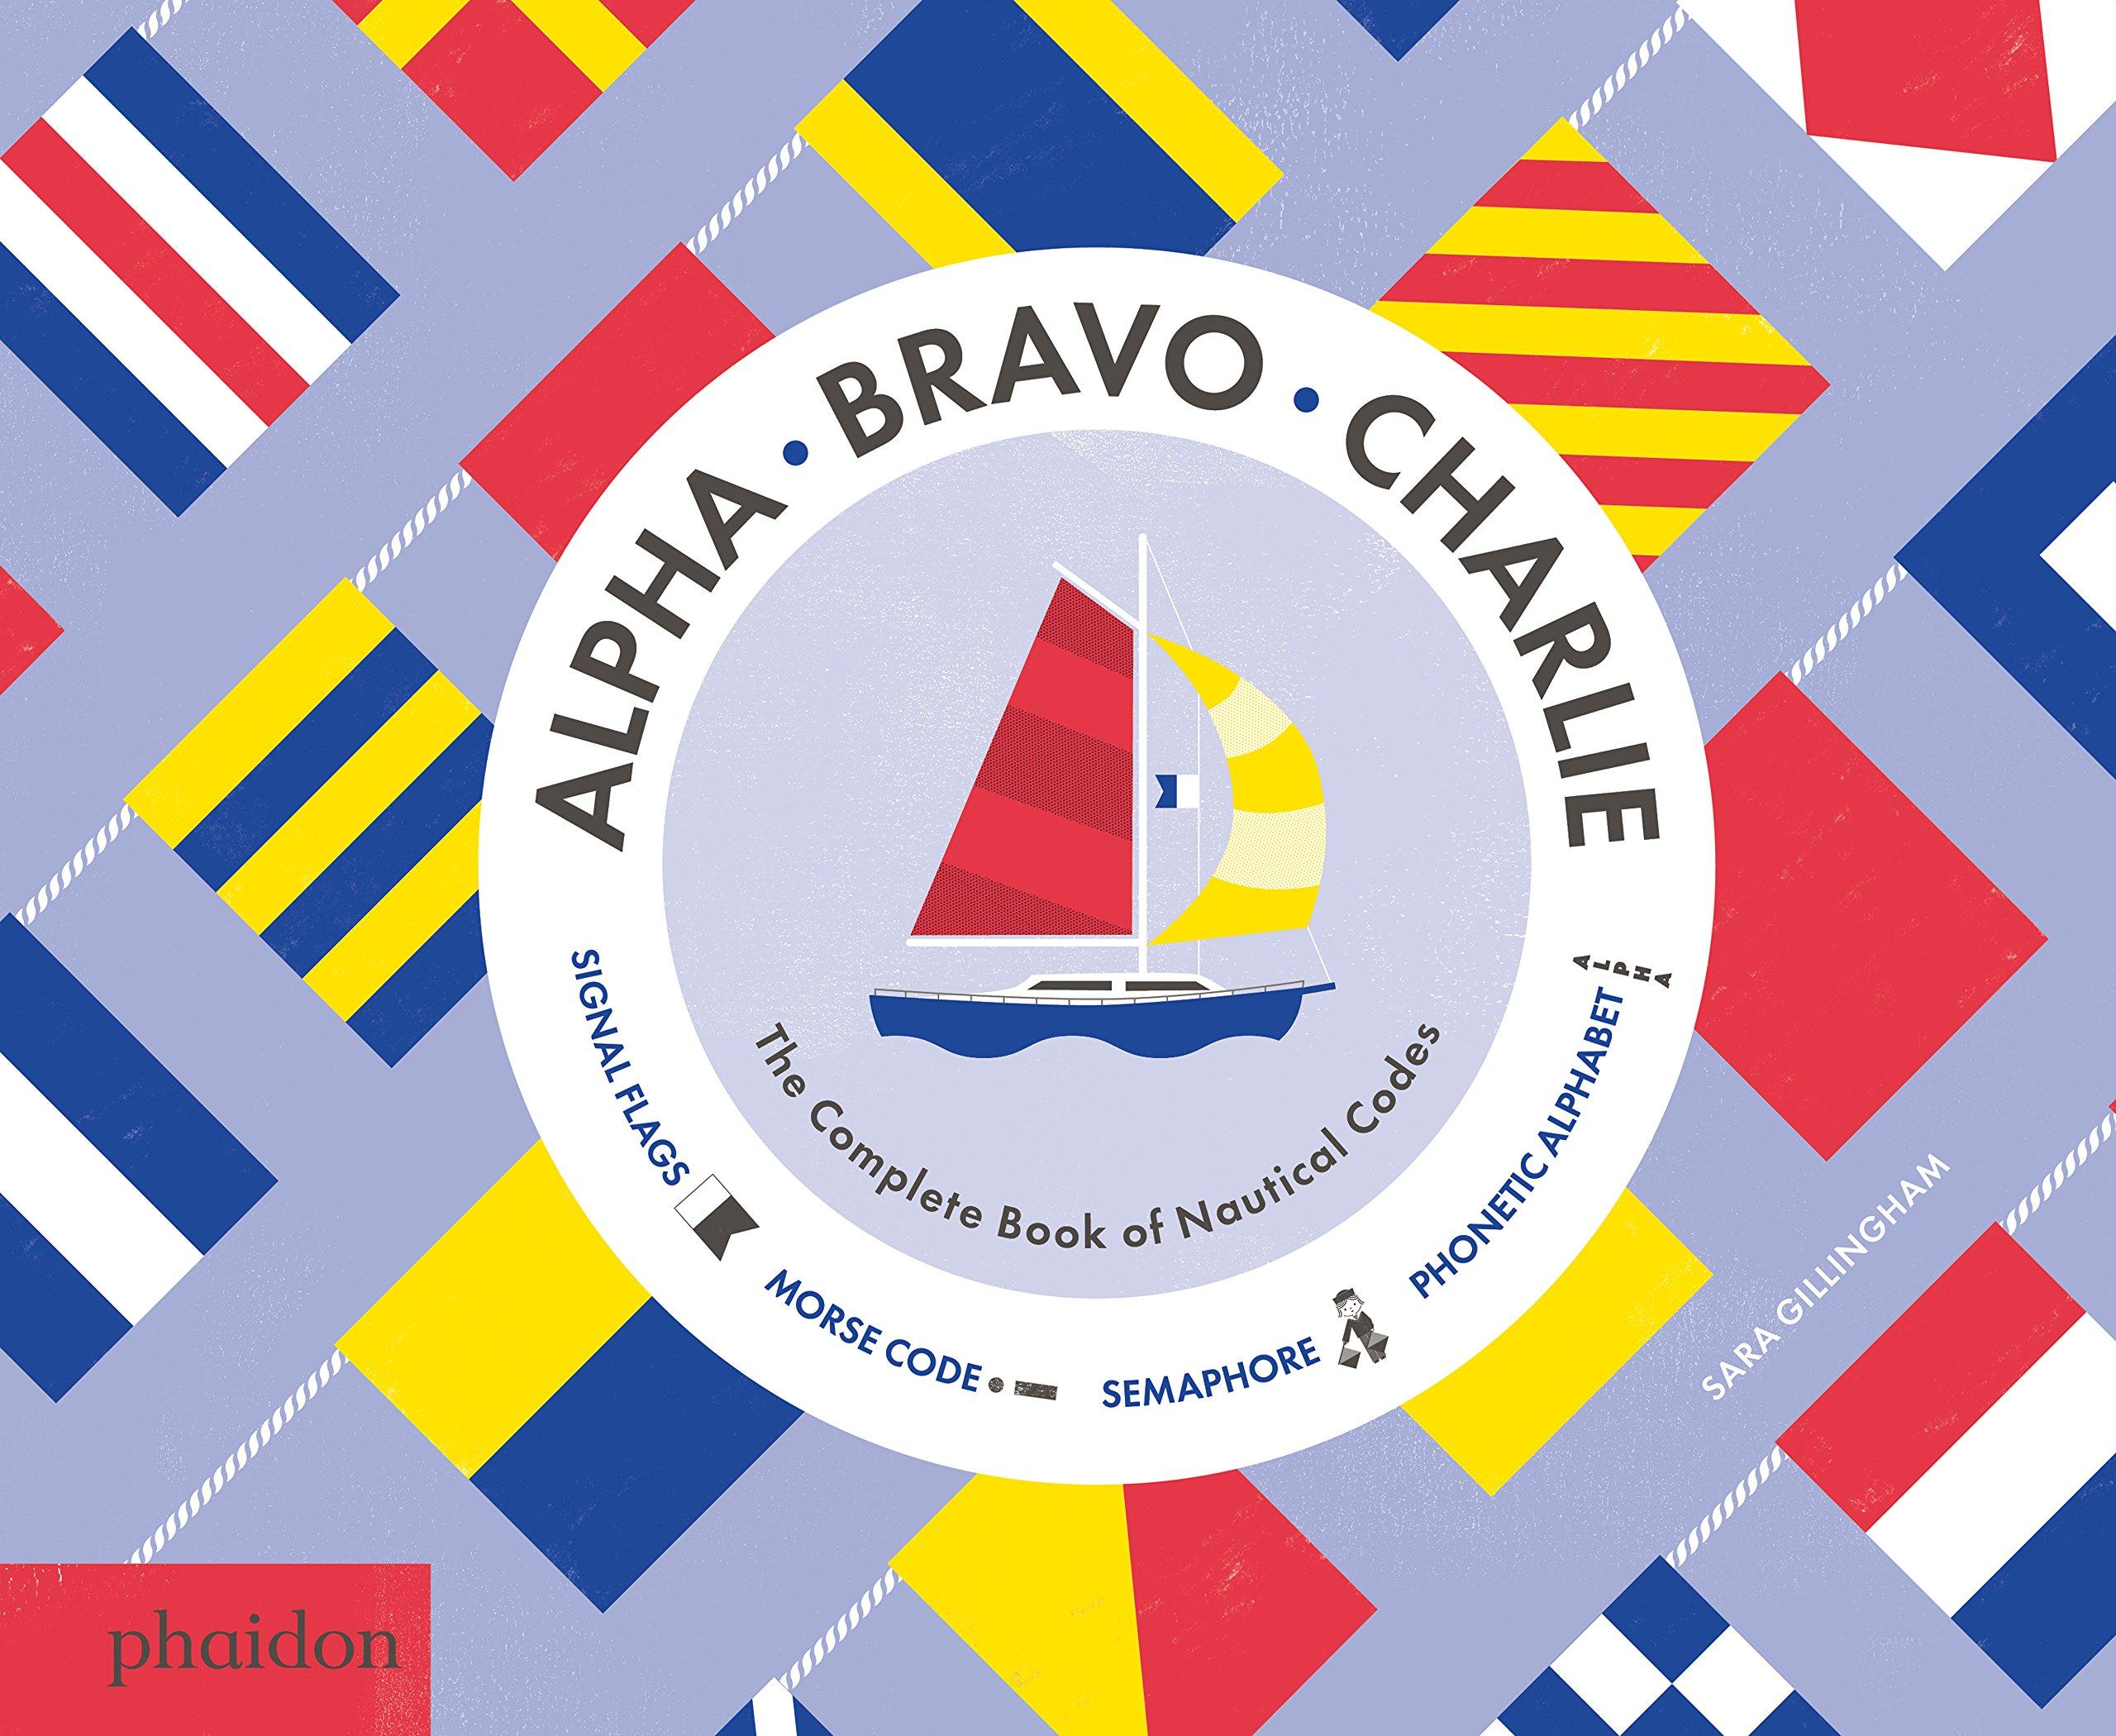 Alpha Bravo Charlie The Complete Book Of Nautical Codes Gillingham Sara 9780714871431 Amazon Com Books